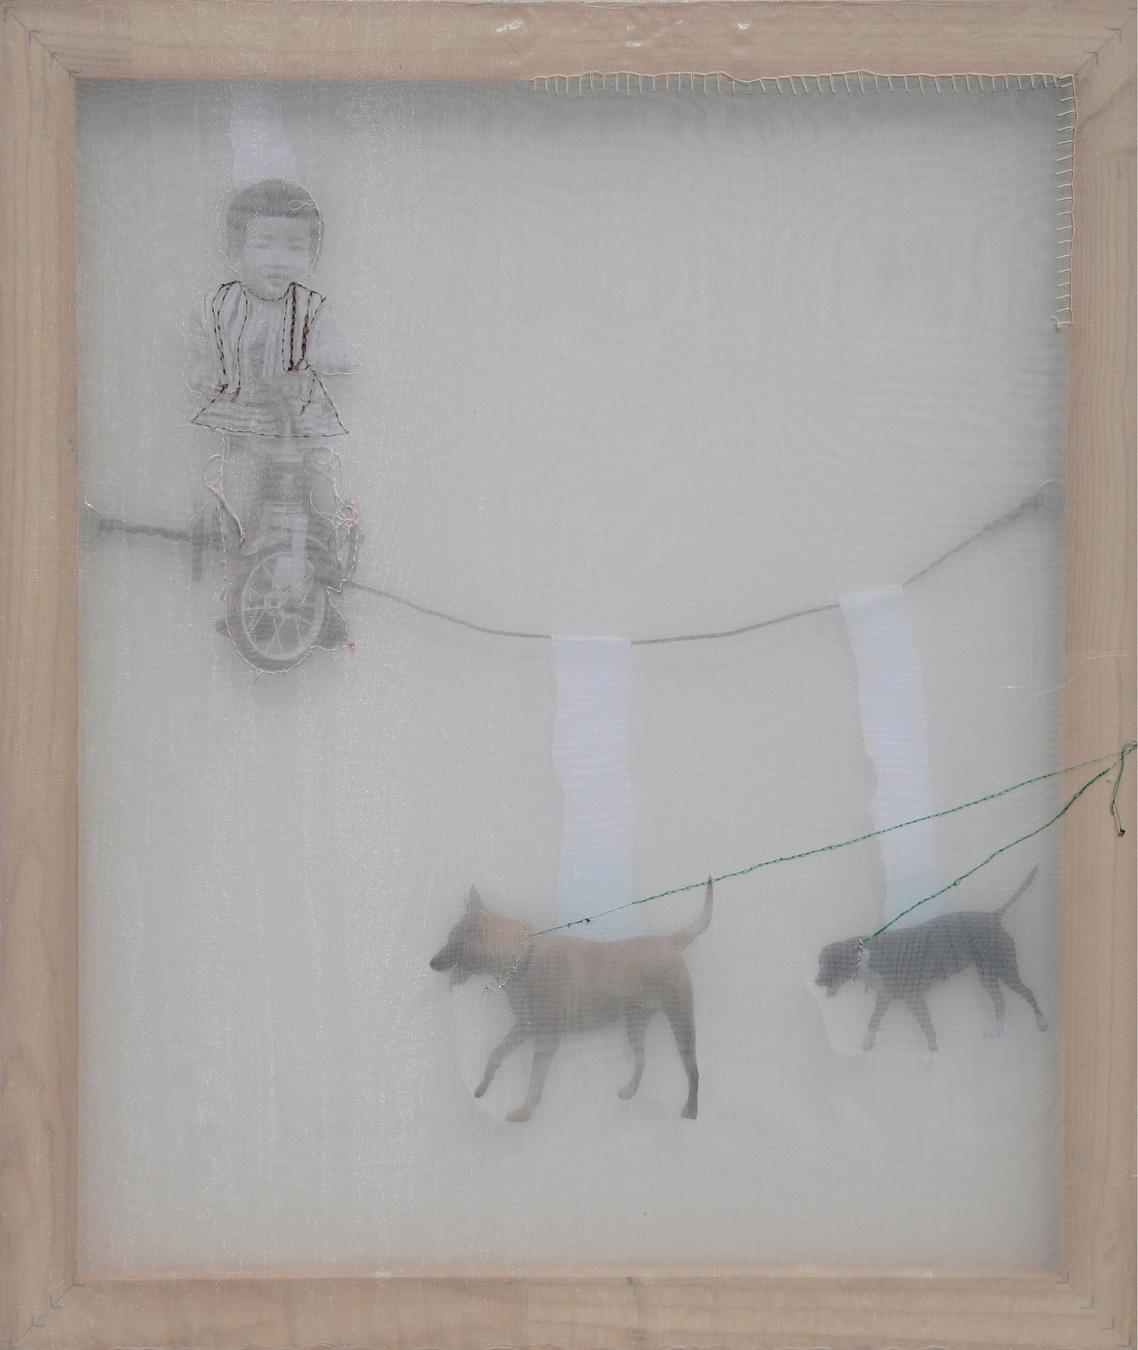 Kaoru Taking a walk with two dogs